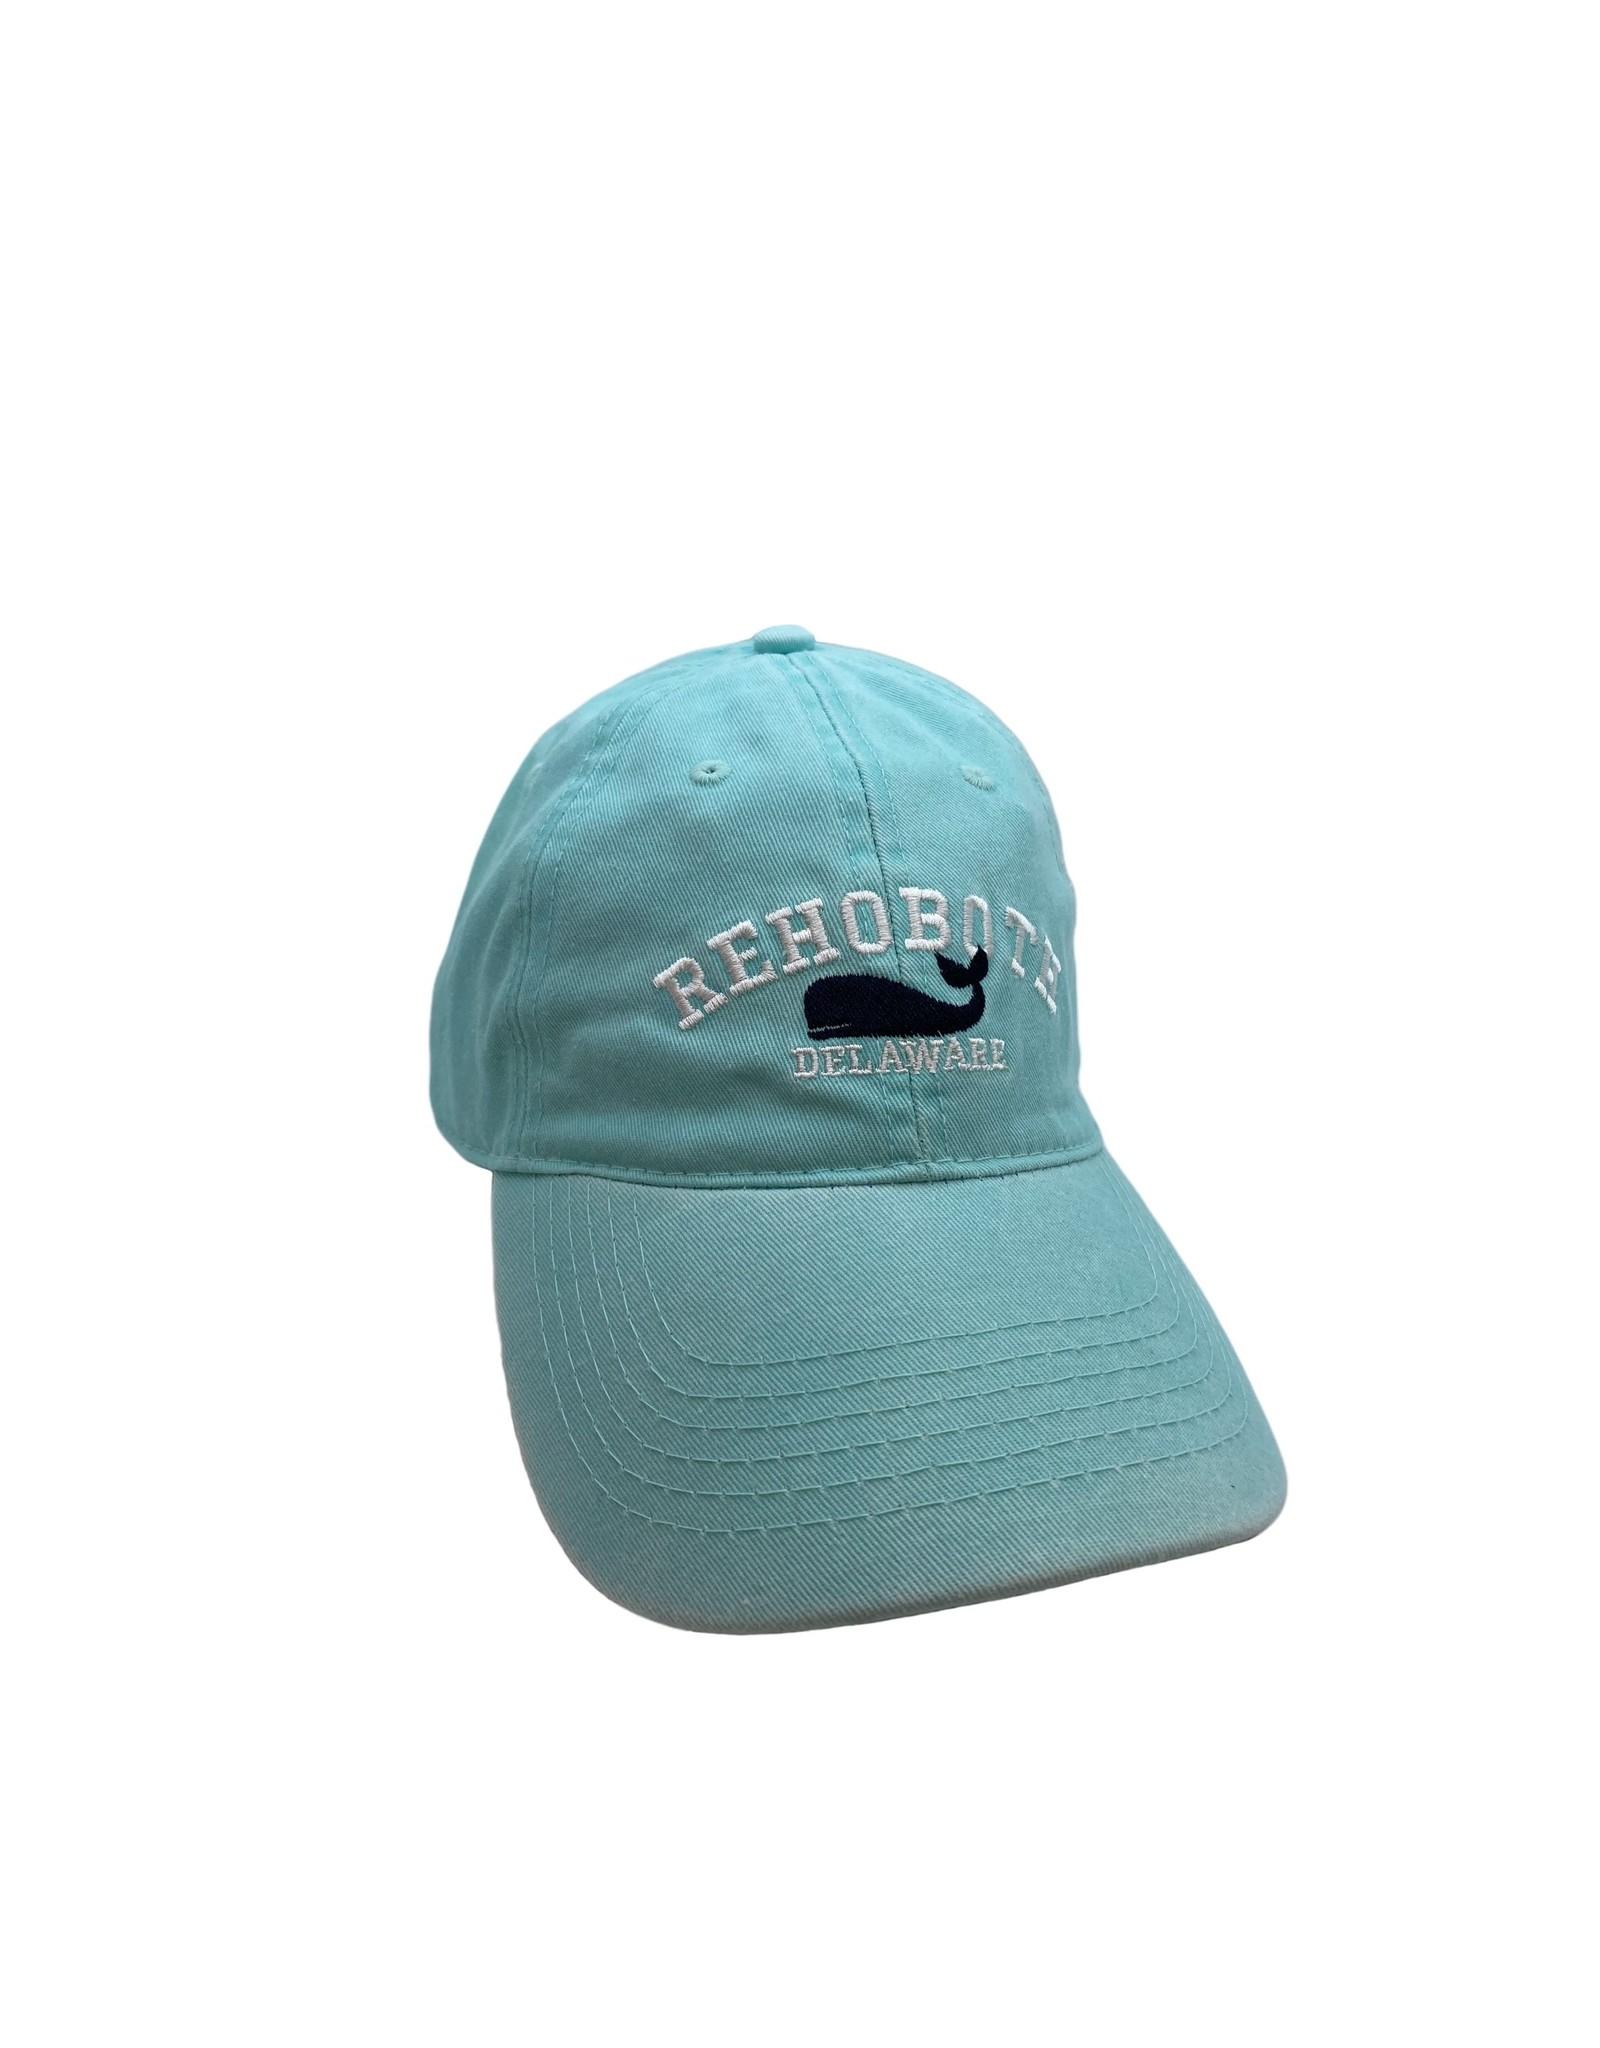 REHOBOTH LIFESTYLE CLASSIC COTTON BEACH HAT